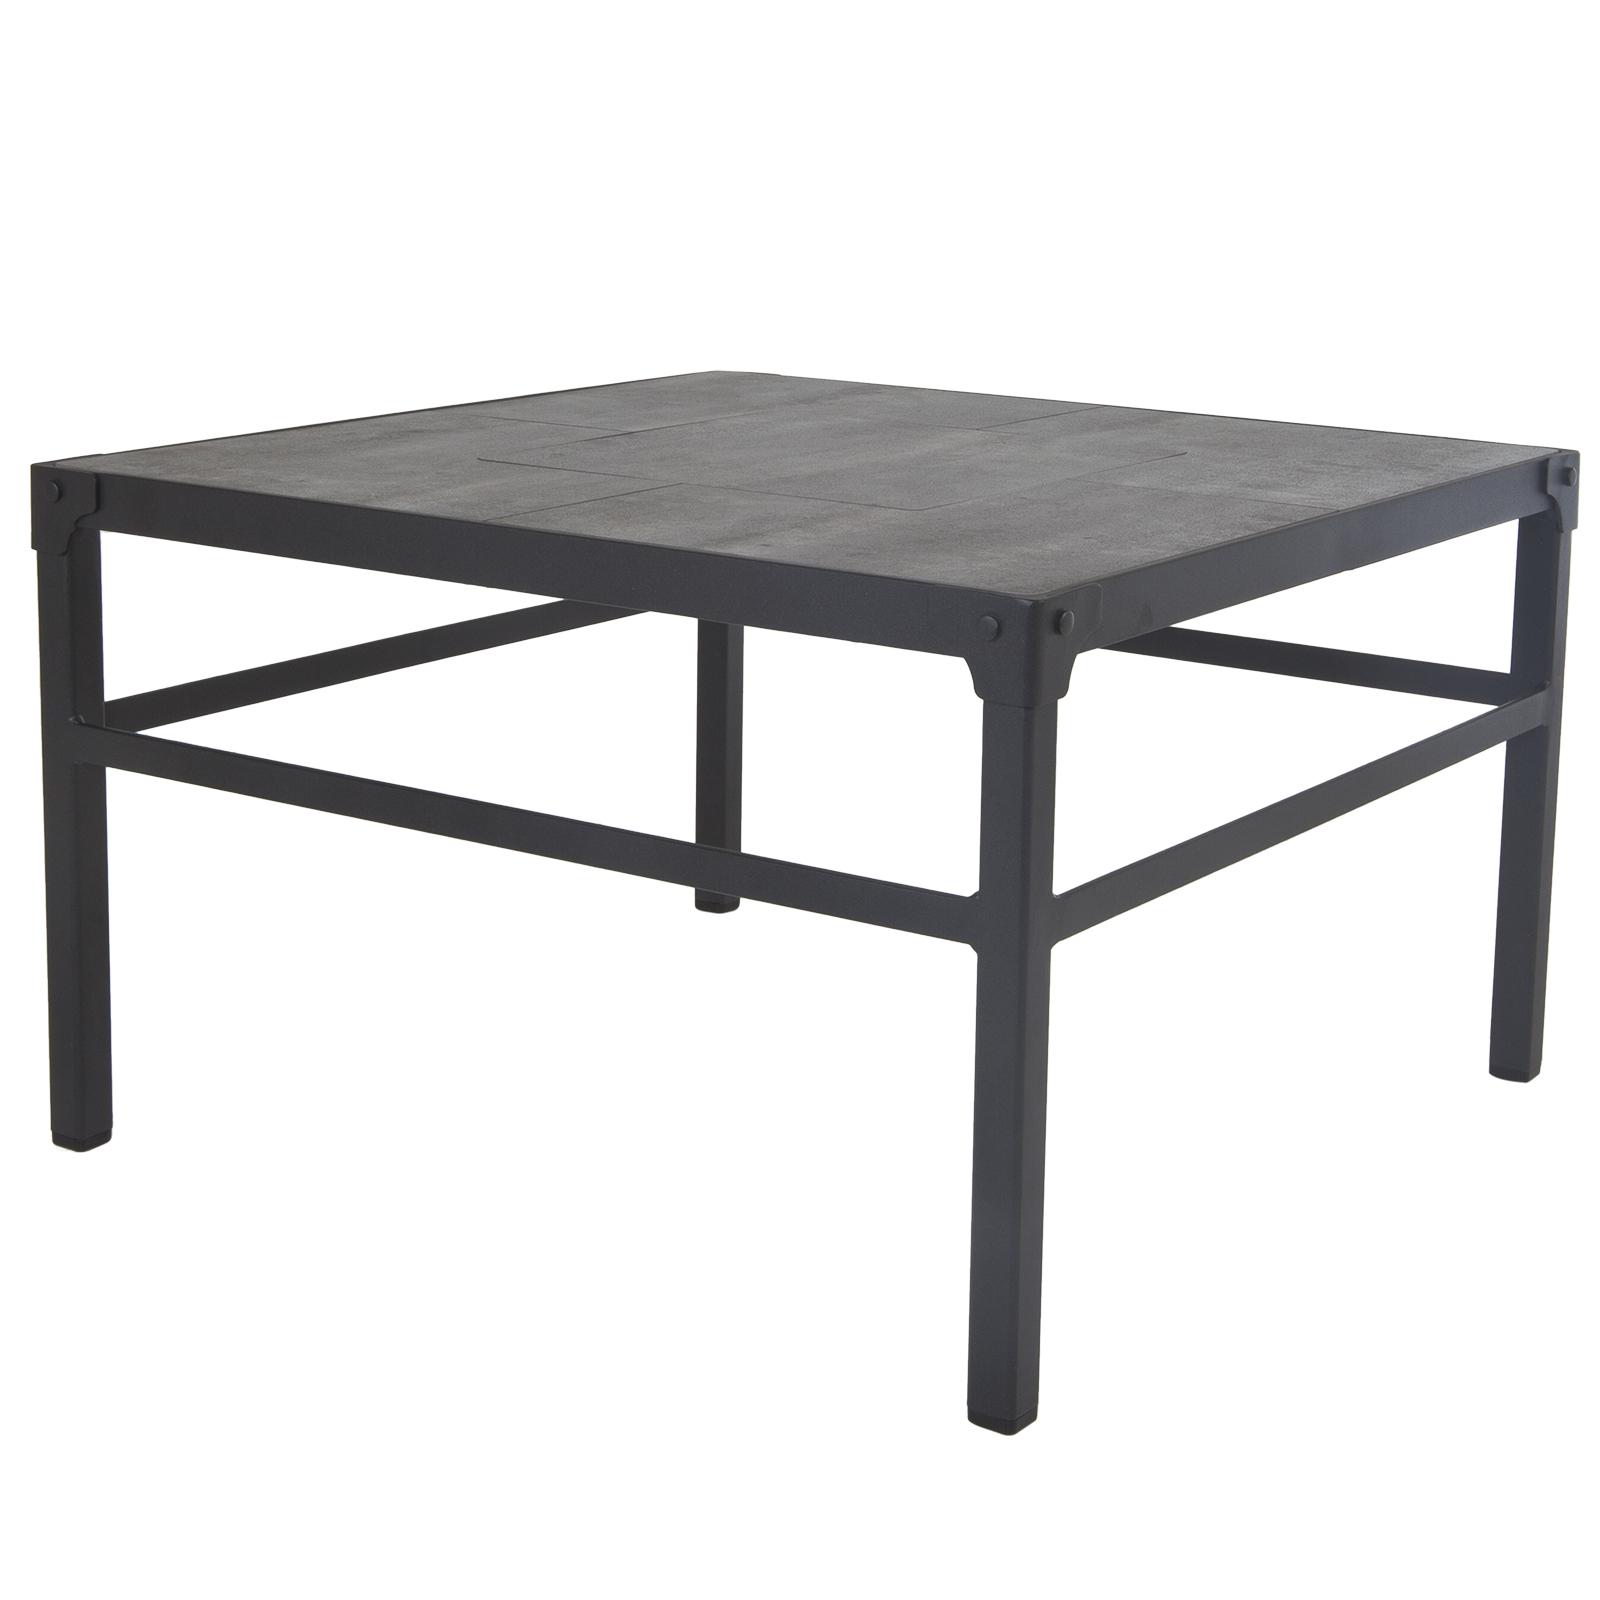 Creighton Iron Accent Tables